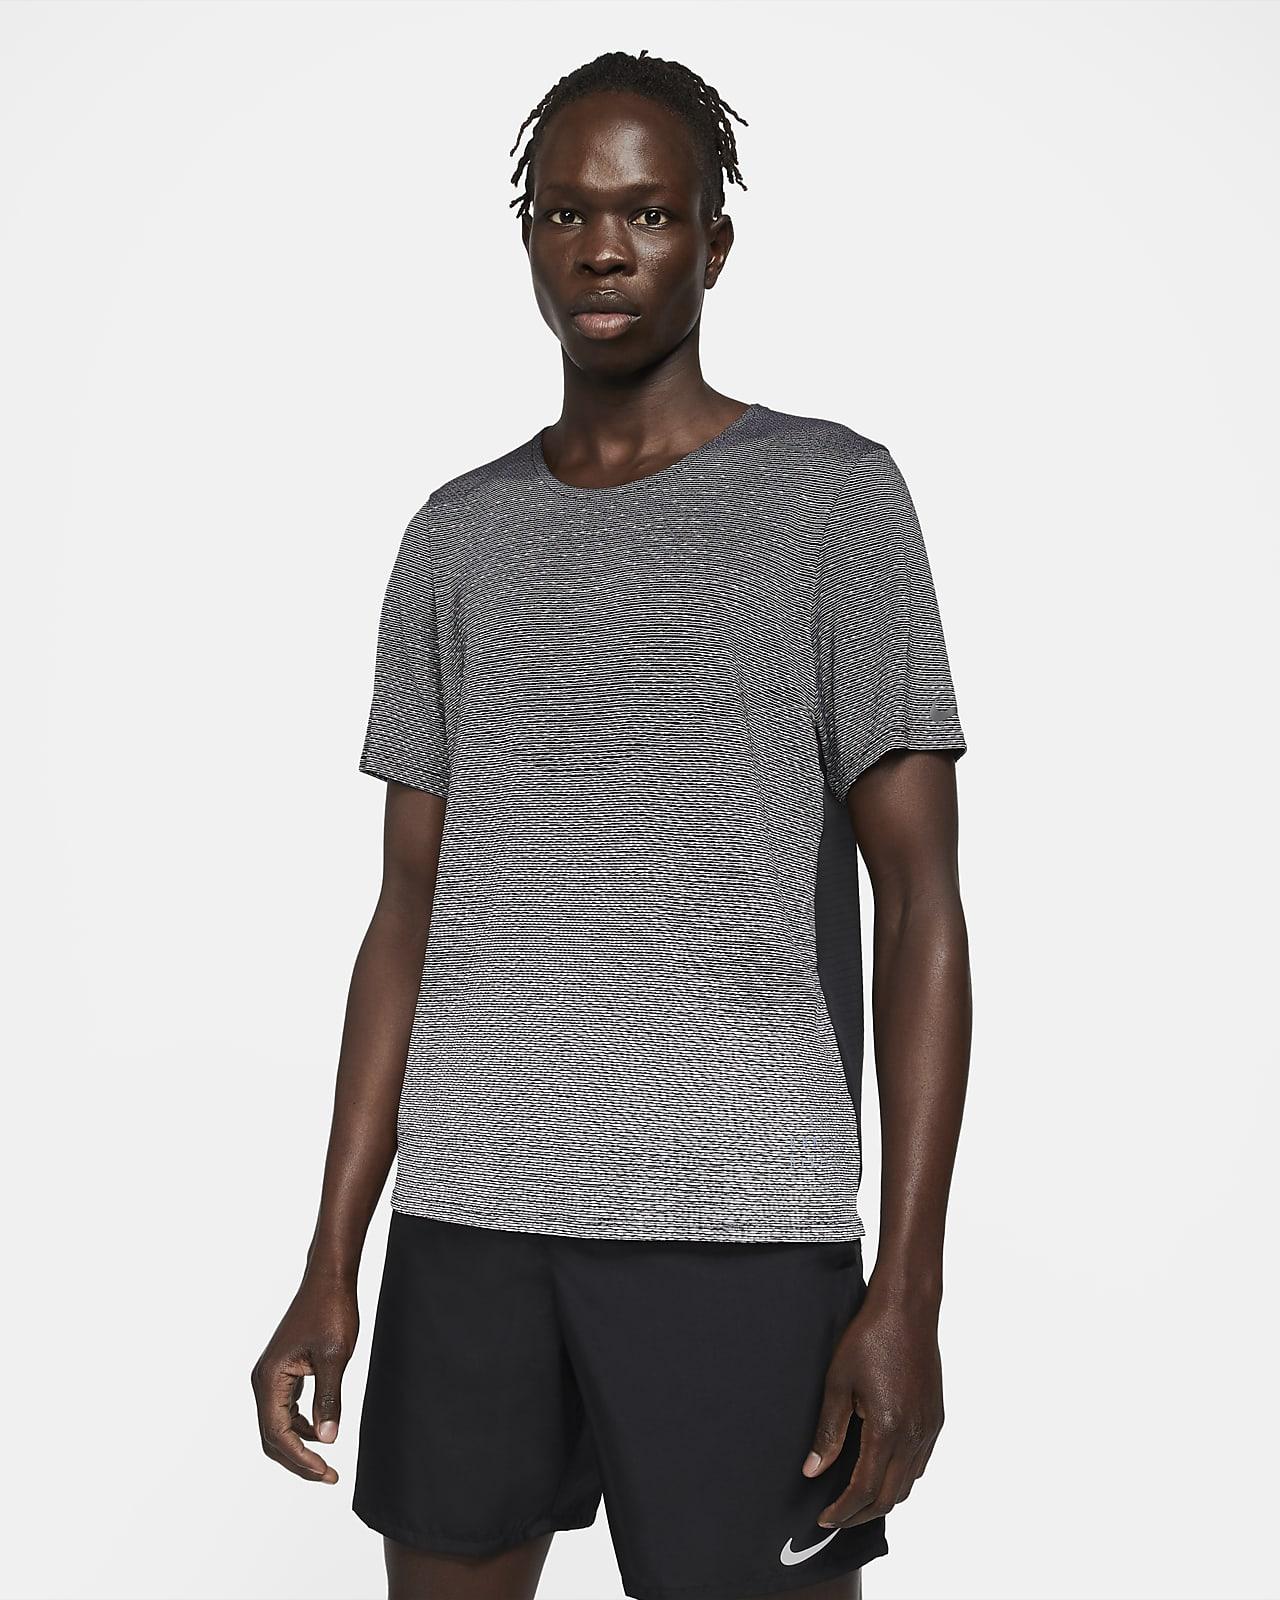 Haut de running à manches courtes Nike Pinnacle Run Division pour Homme